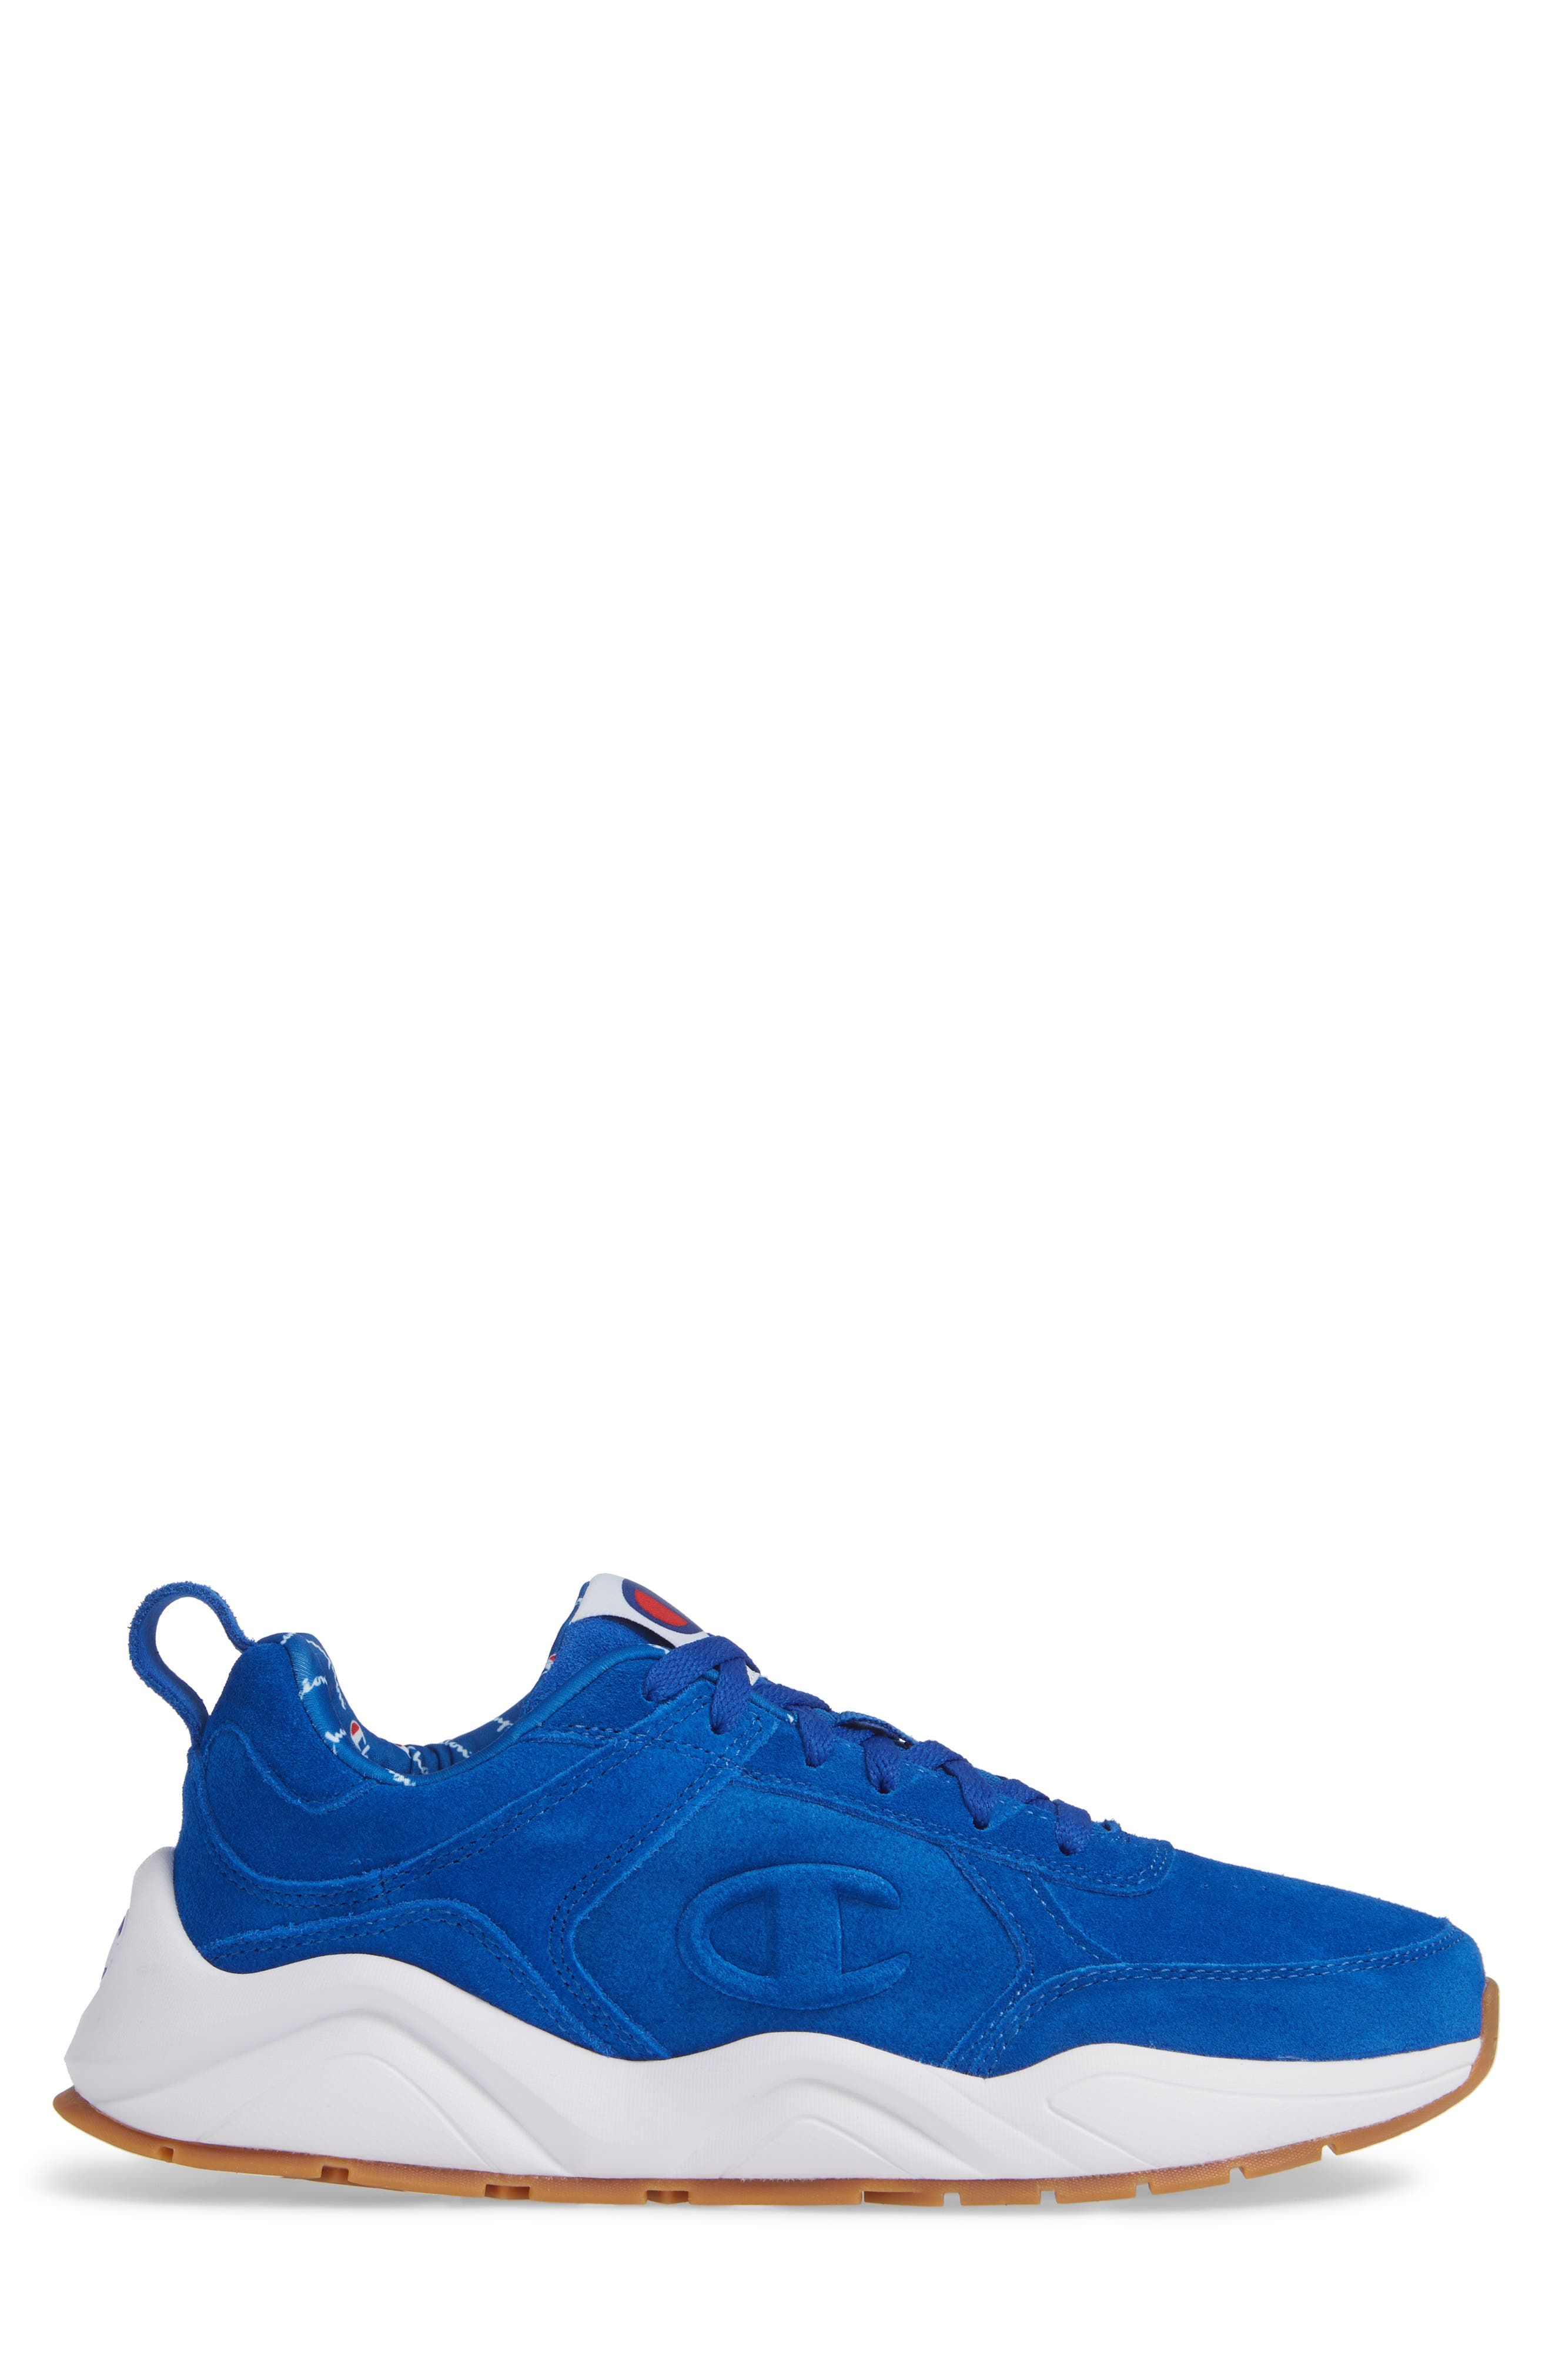 93Eighteen Sneaker,                             Alternate thumbnail 3, color,                             BLUE SUEDE